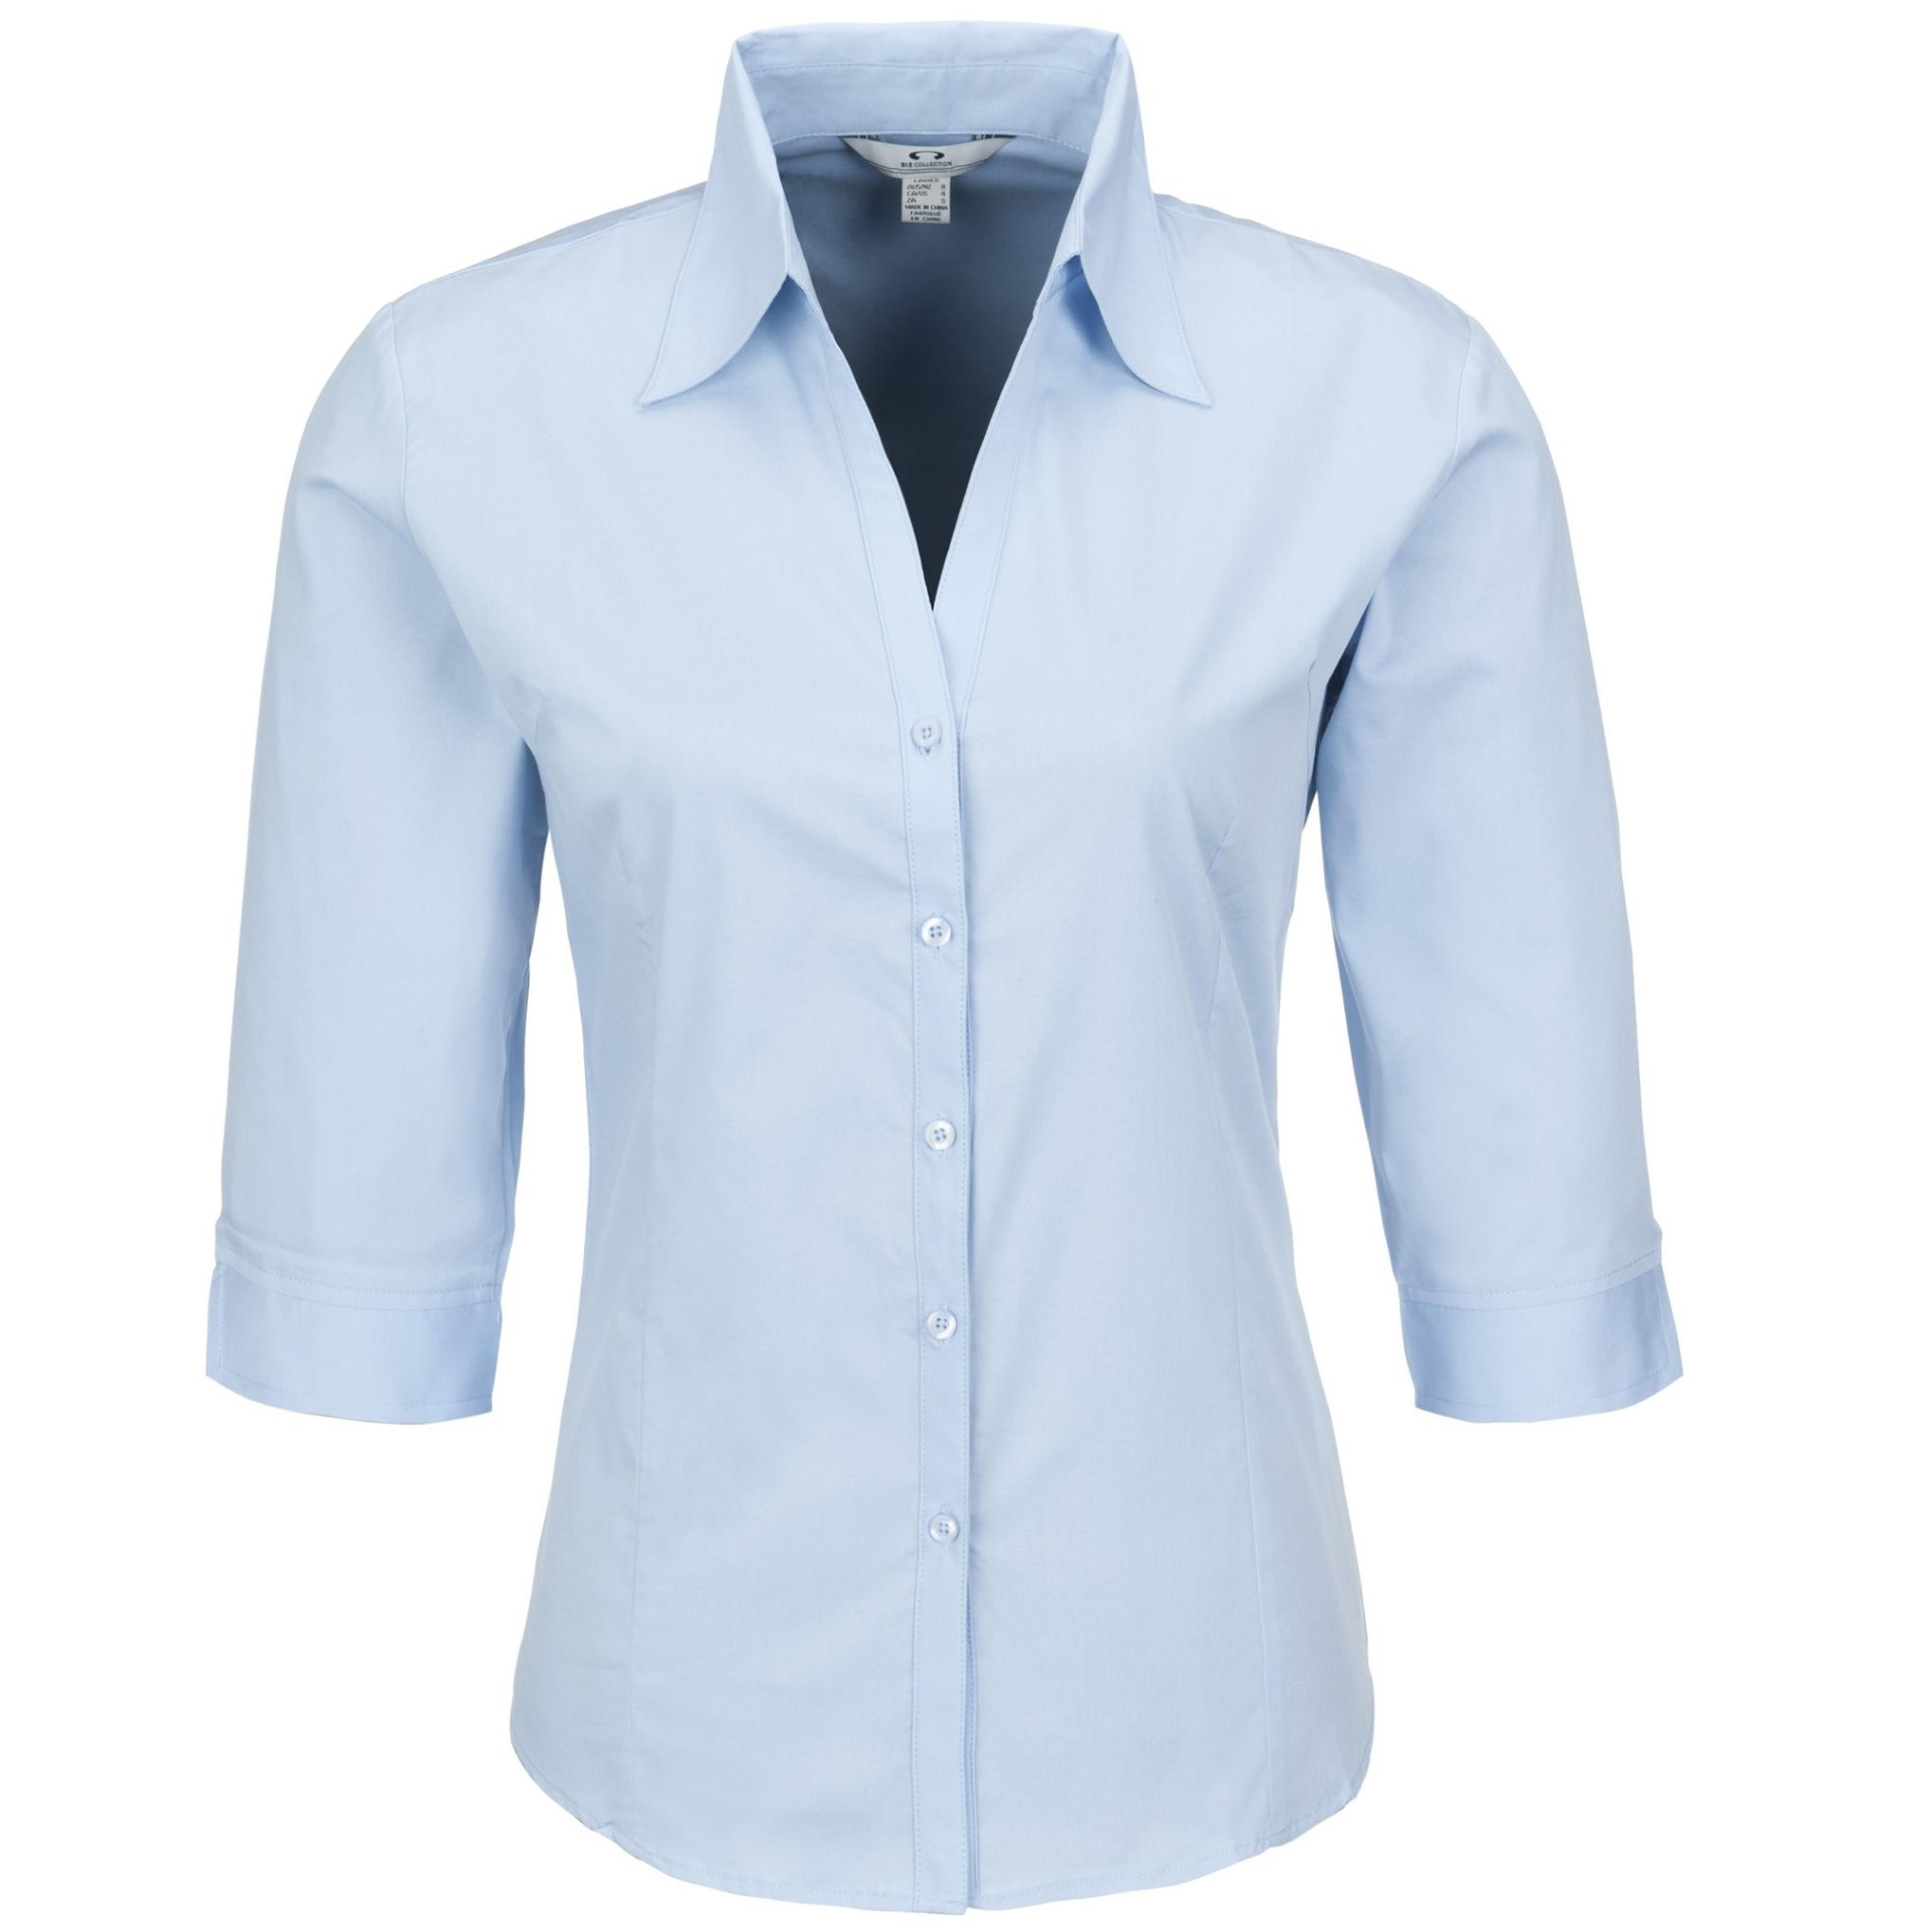 Ladies 3/4 Sleeve Metro Shirt - Light Blue Only